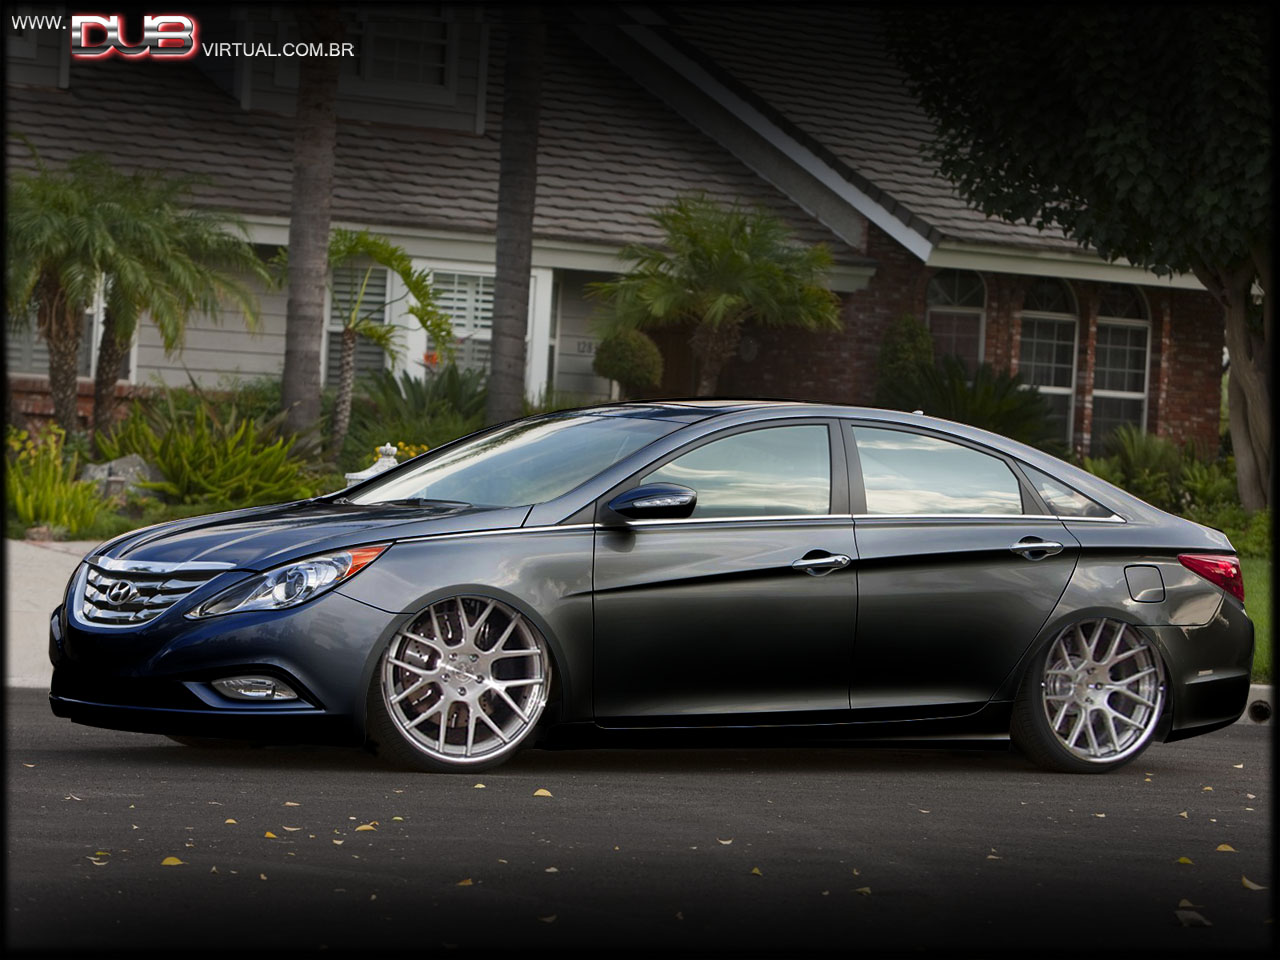 http://4.bp.blogspot.com/-Y-lJ6cppV58/TdL6ourcdFI/AAAAAAAAAoM/3Bn3Fv_UcJQ/s1600/Hyundai+Sonata+2011+dub+rebaixado.jpg